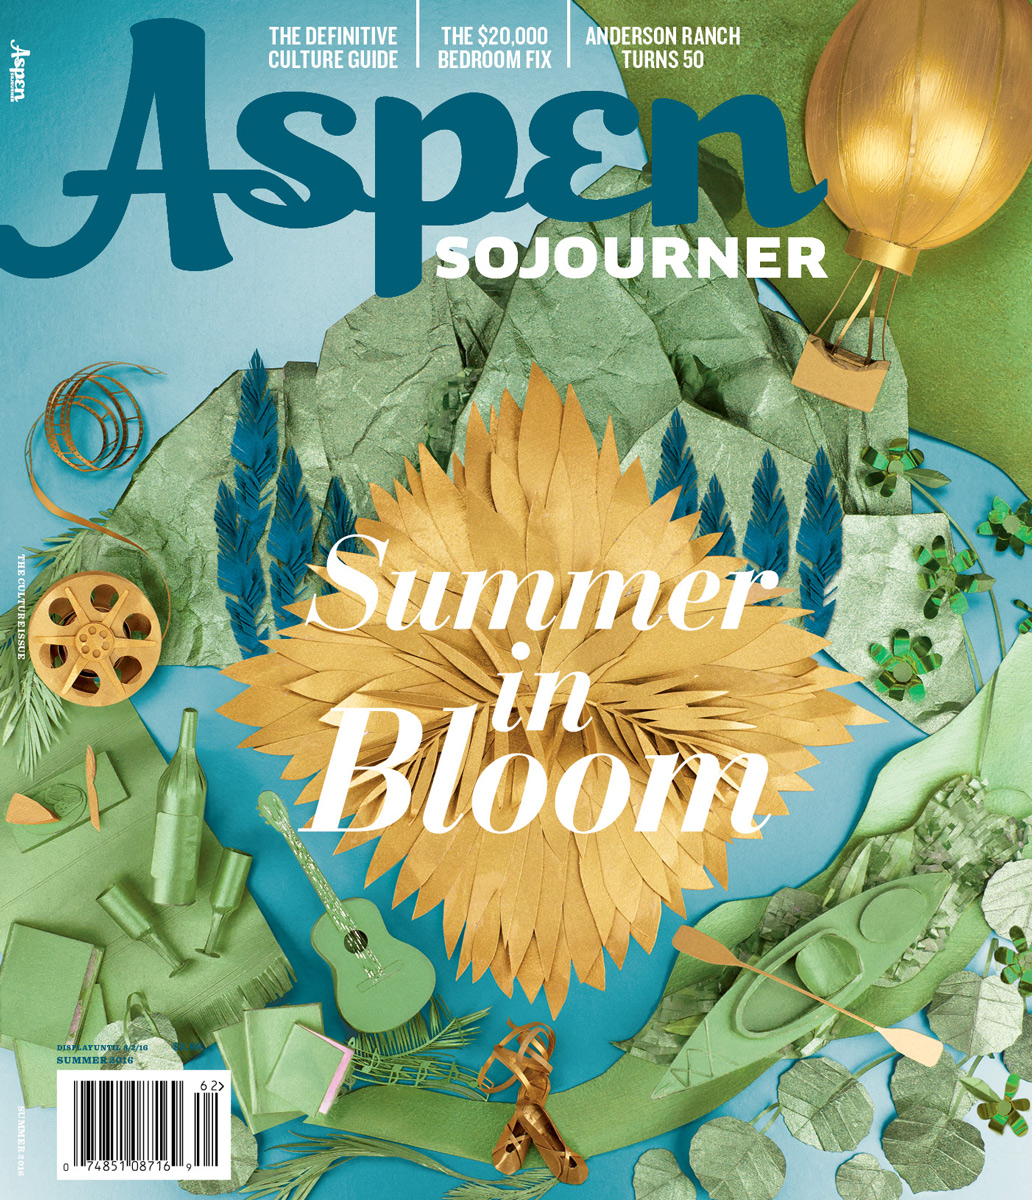 Nicole-Licht_Aspen-Sojourner-cover